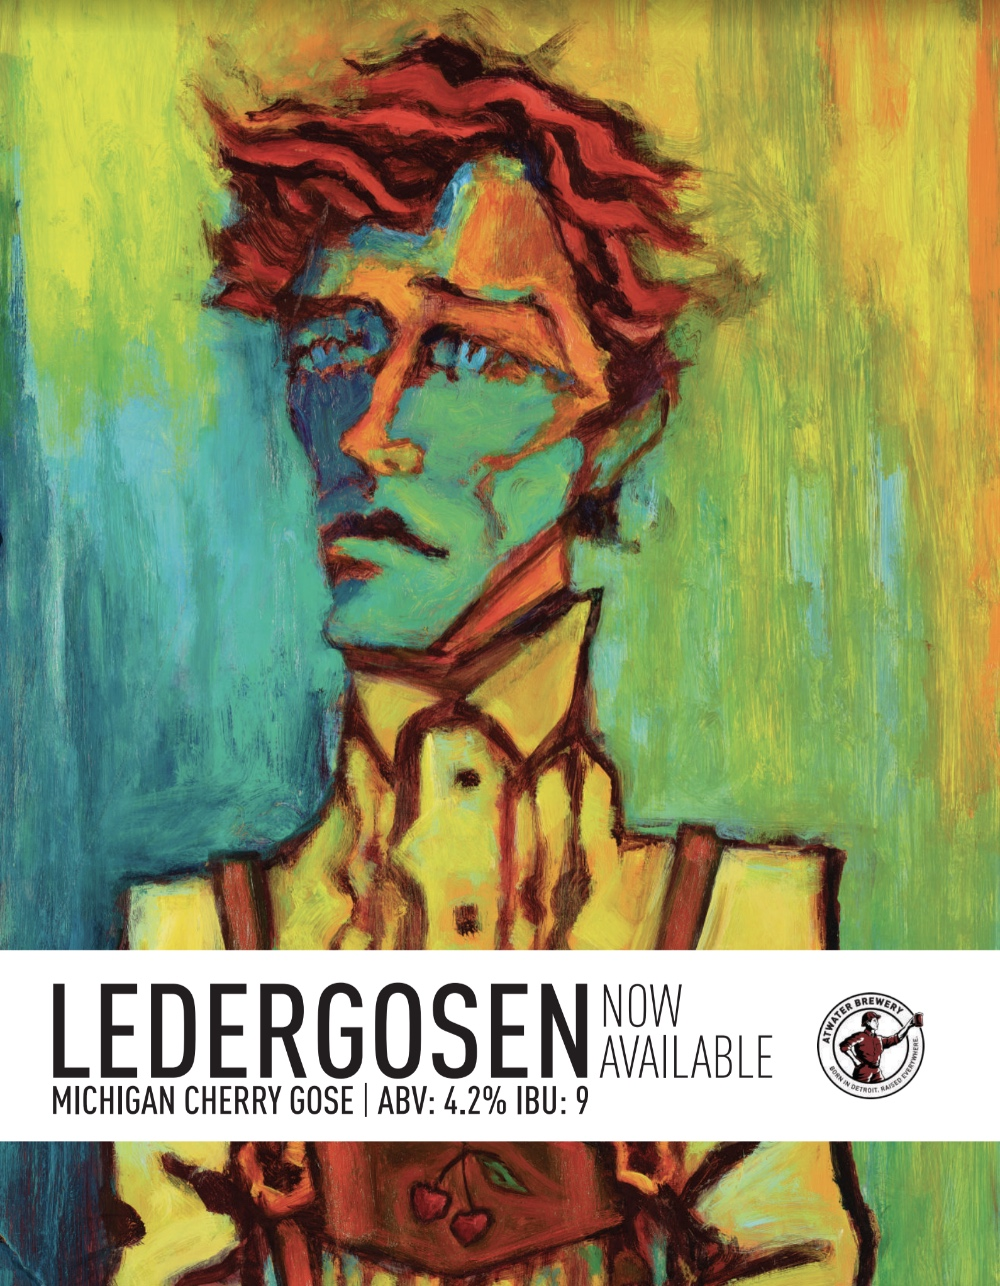 Atwater Releases 'Ledergosen' Michigan Cherry Gose   Brewbound